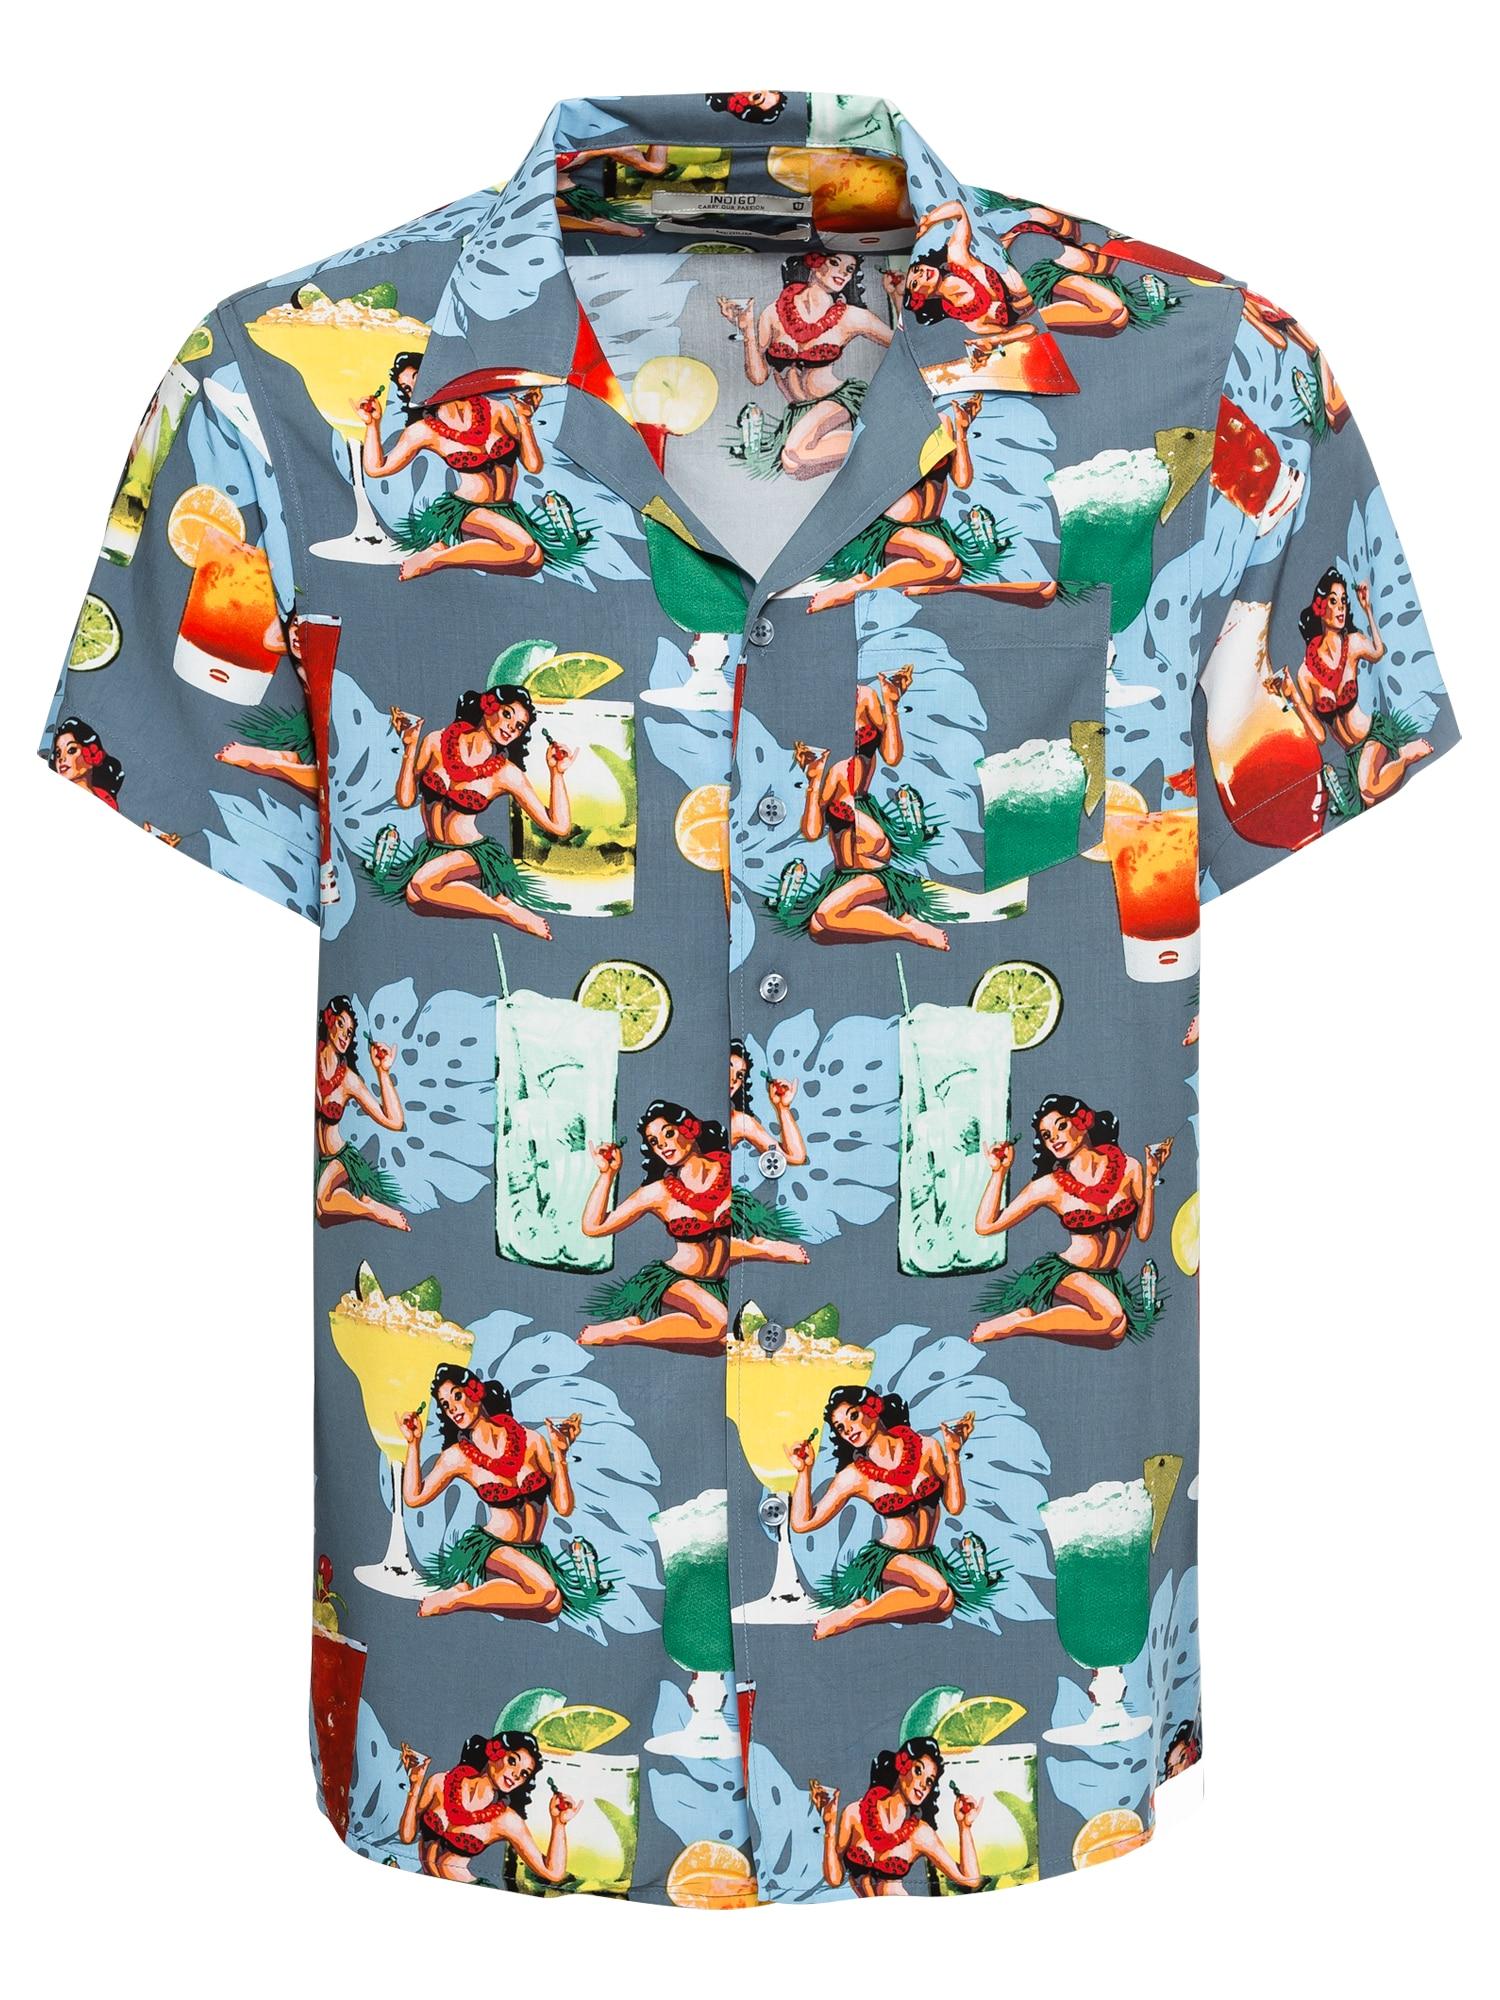 Košile Gathorne světlemodrá mix barev INDICODE JEANS